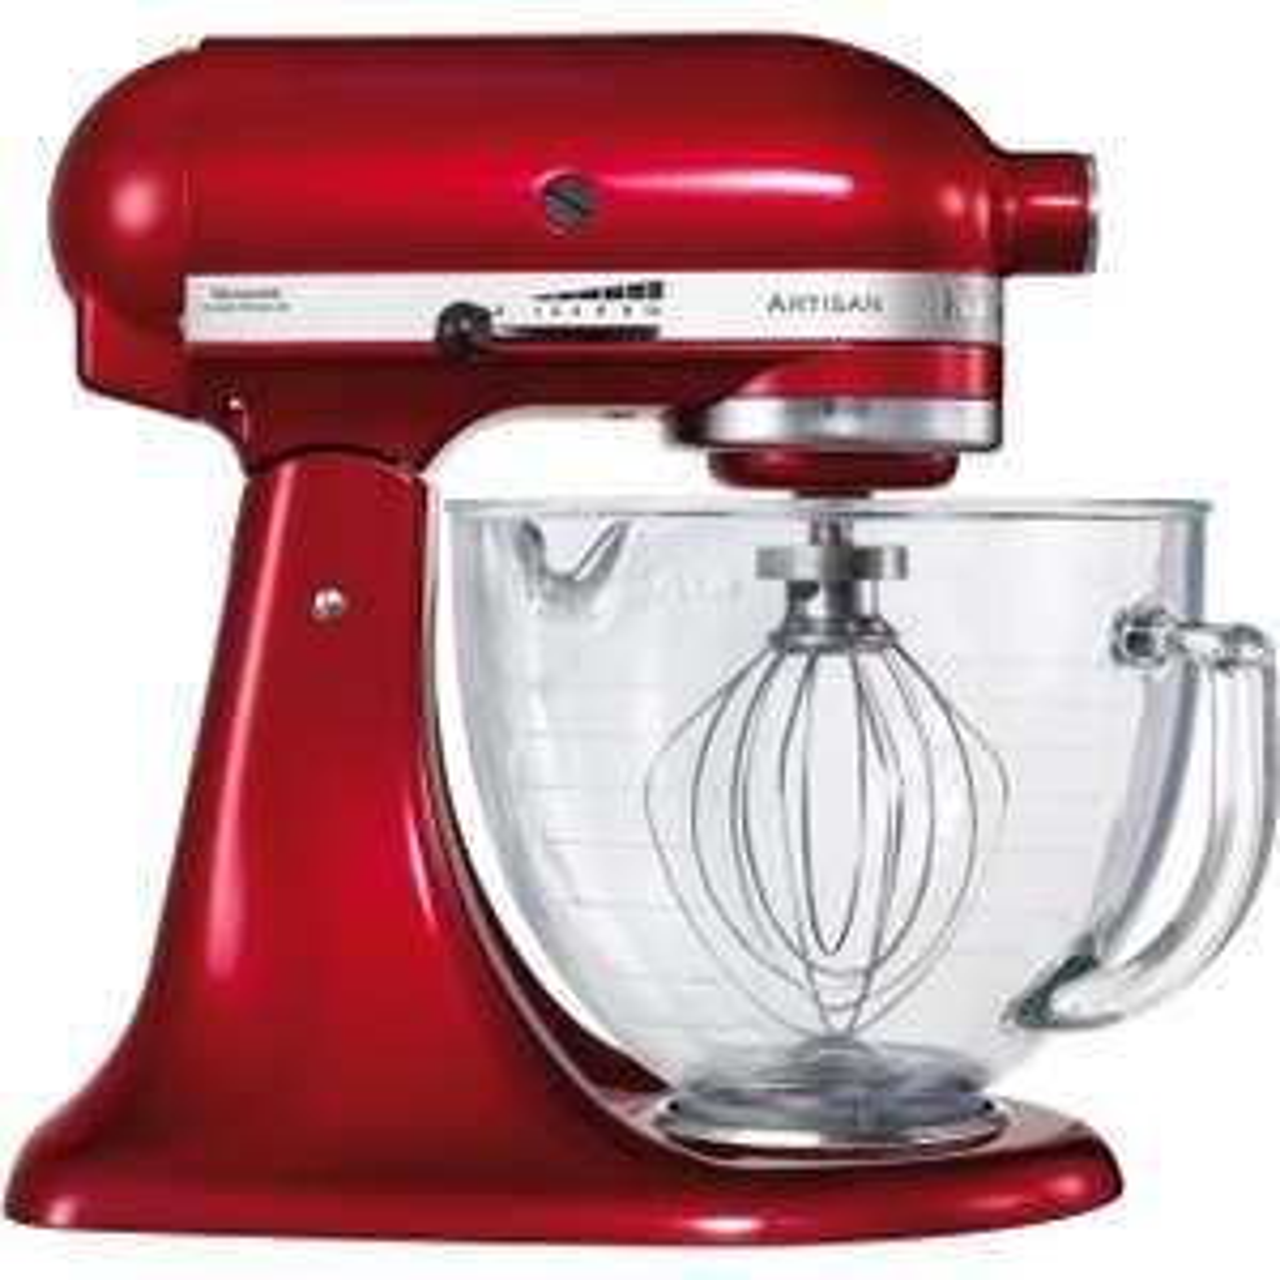 KitchenAid Artisan 5KSM156BCA Stand Mixer at ao.com for £299 - £300 off!